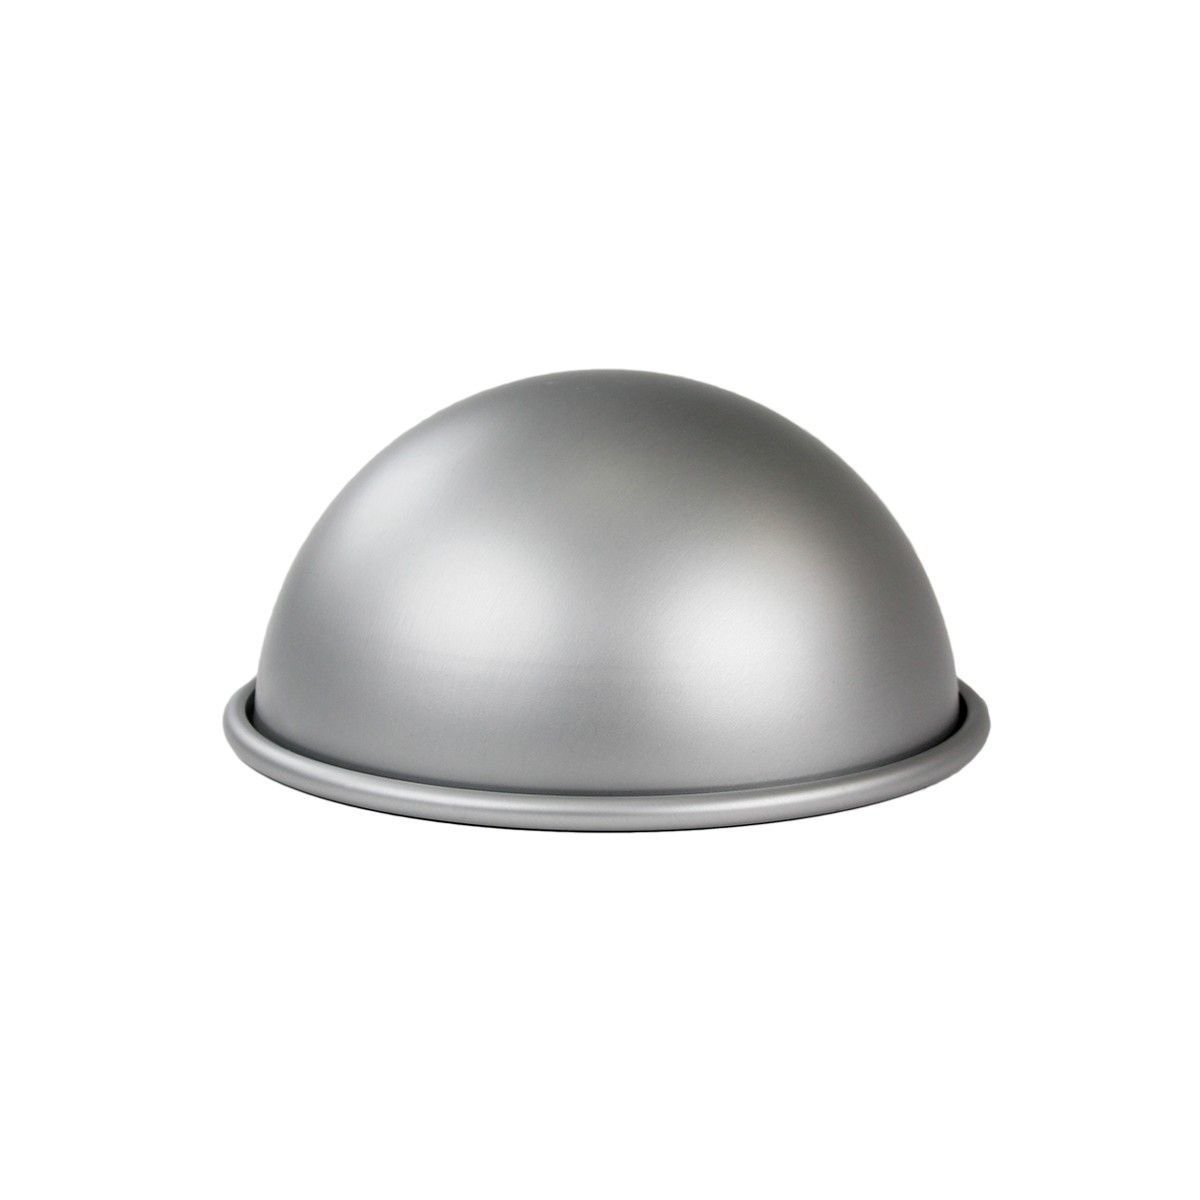 PME - Large Ball Pan Hemisphere - Μεγάλο Ταψί Ημισφαίριο - 20x10εκ